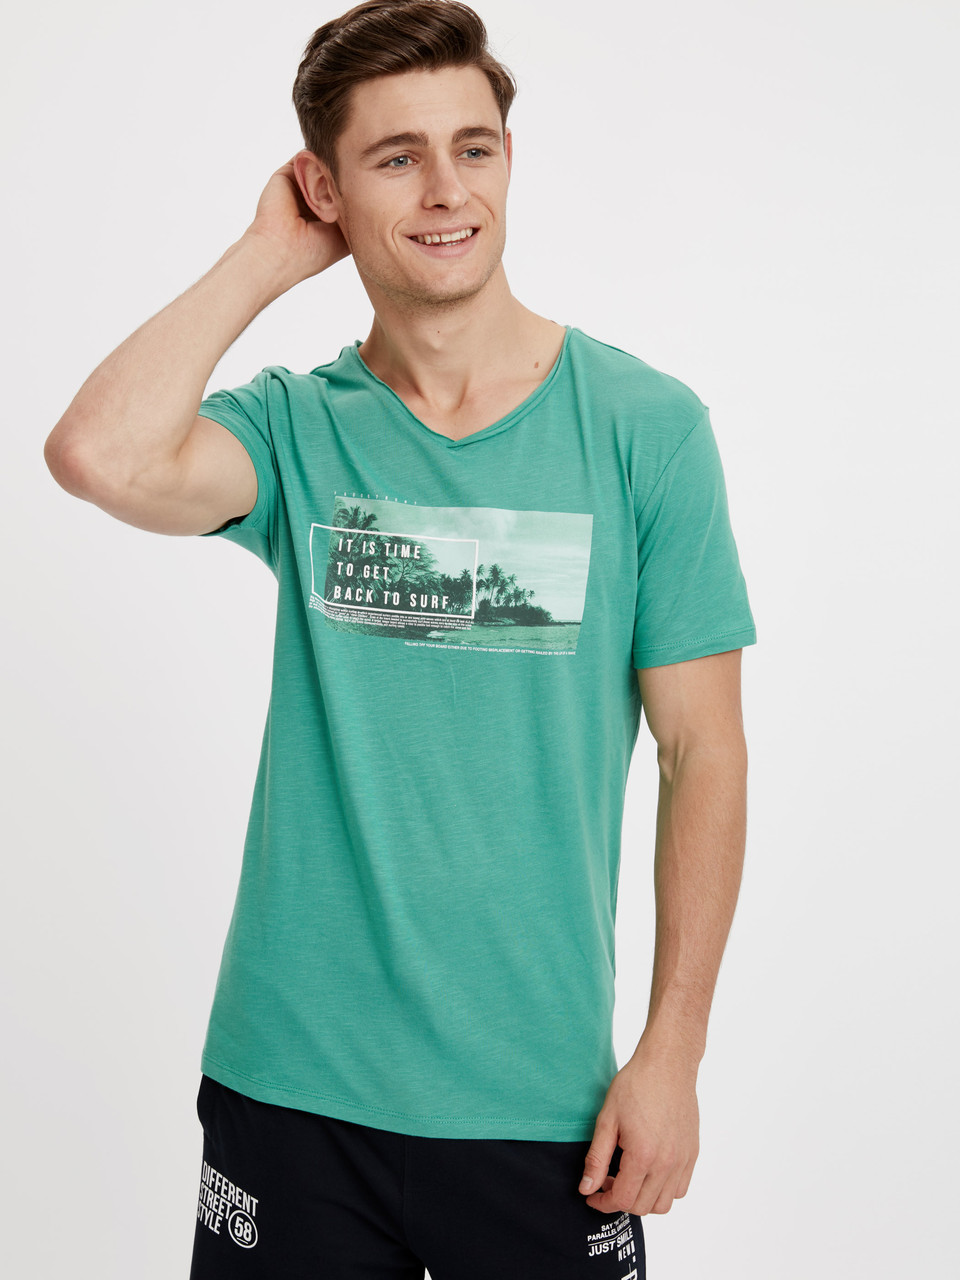 Зеленая мужская футболка Lc Waikiki / Лс Вайкики с надписью It is time to get back to surf